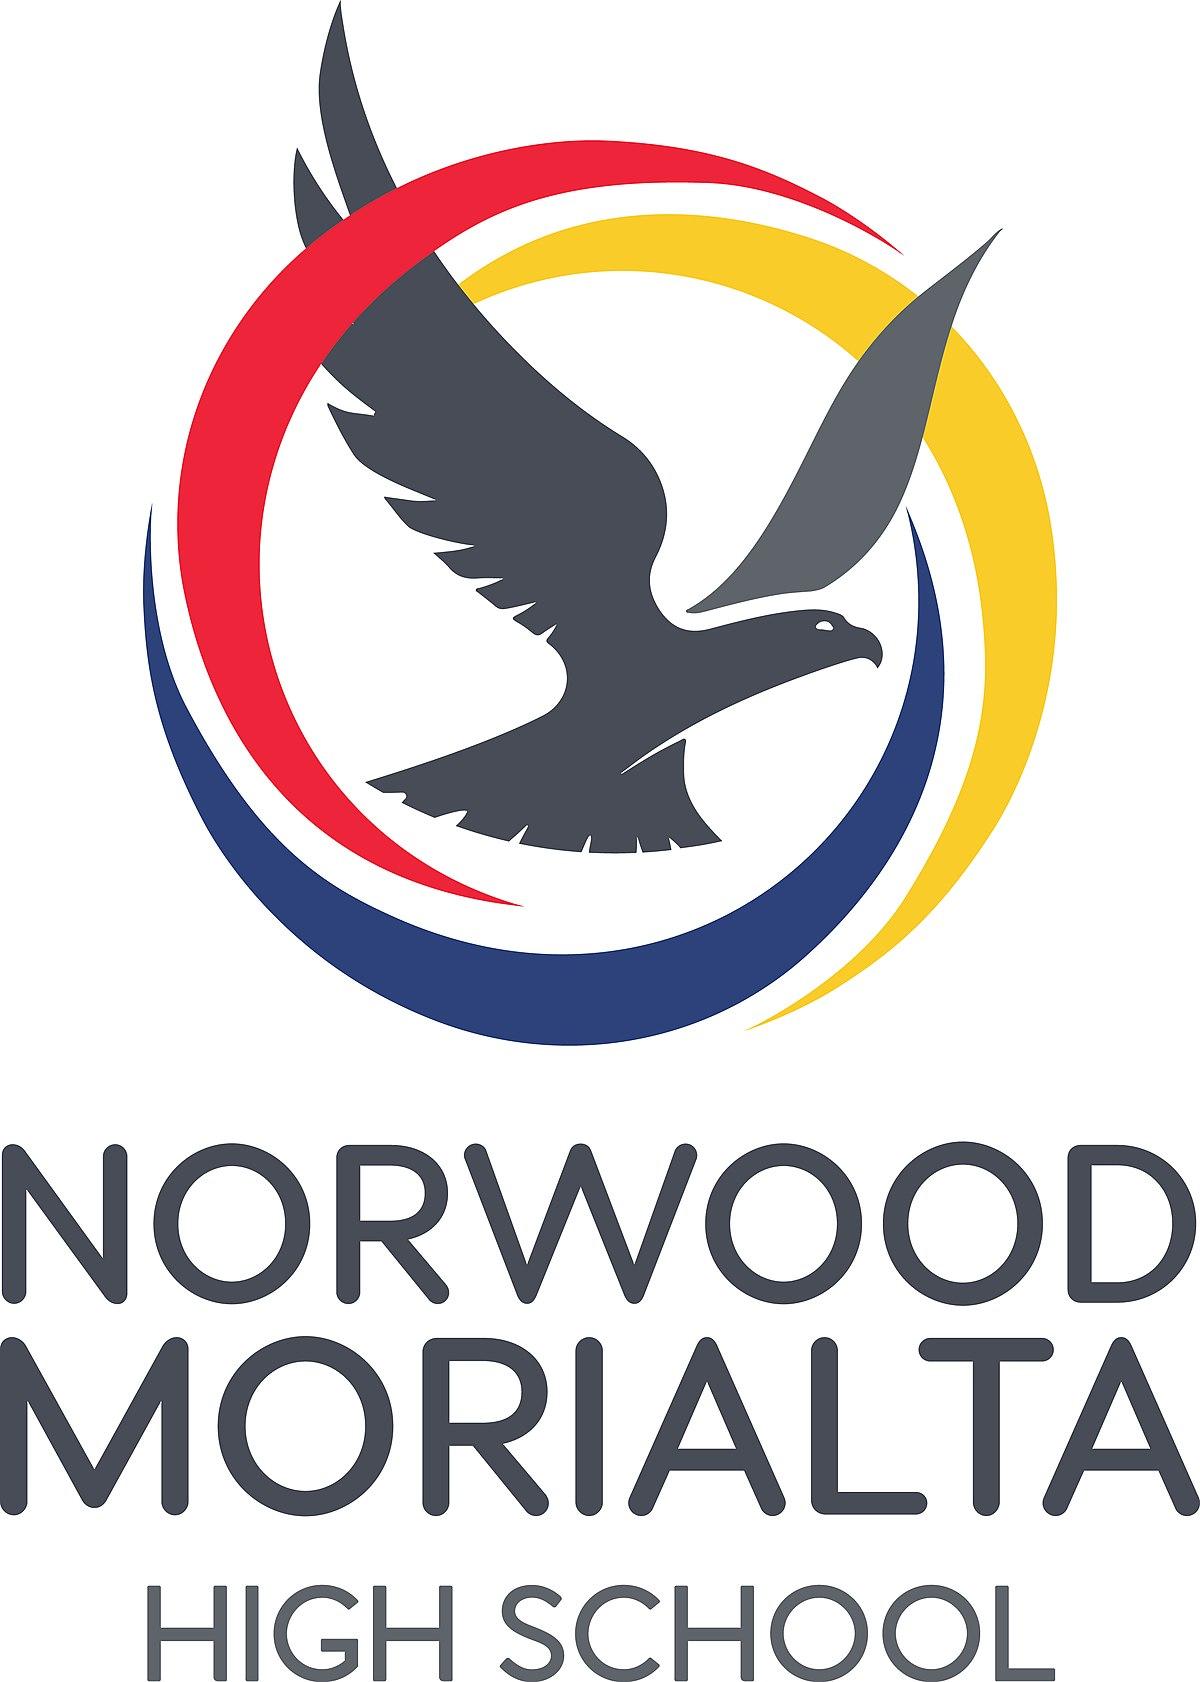 Norwood Morialta High School - Wikipedia